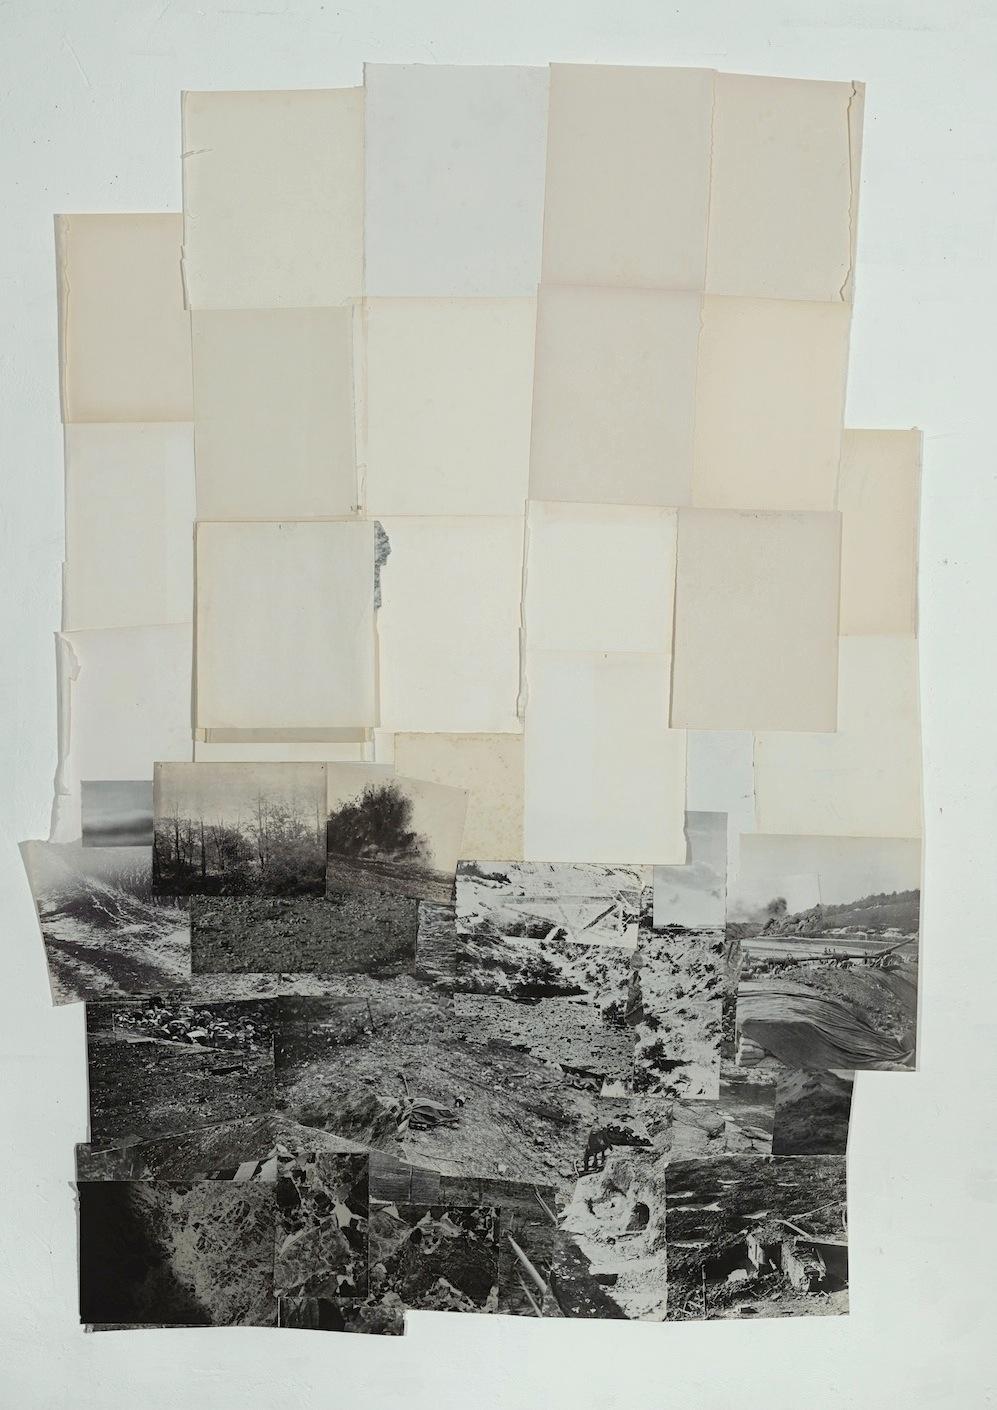 Dieuwke Spaans, Landscape mixed media / collage, 180 x 129 cm